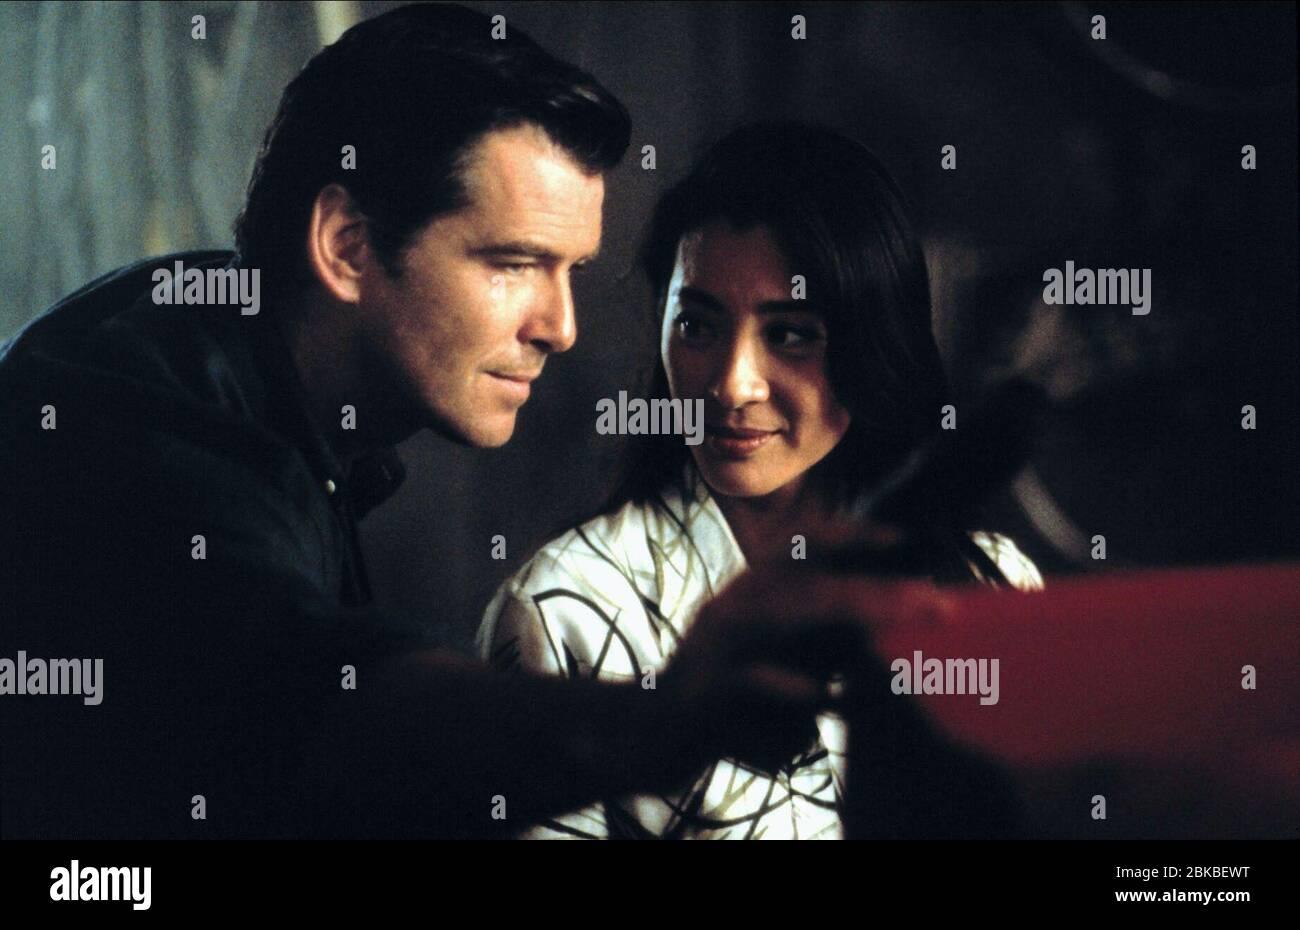 Pierce Brosnan Michelle Yeoh Tomorrow Never Dies 1997 Stock Photo Alamy